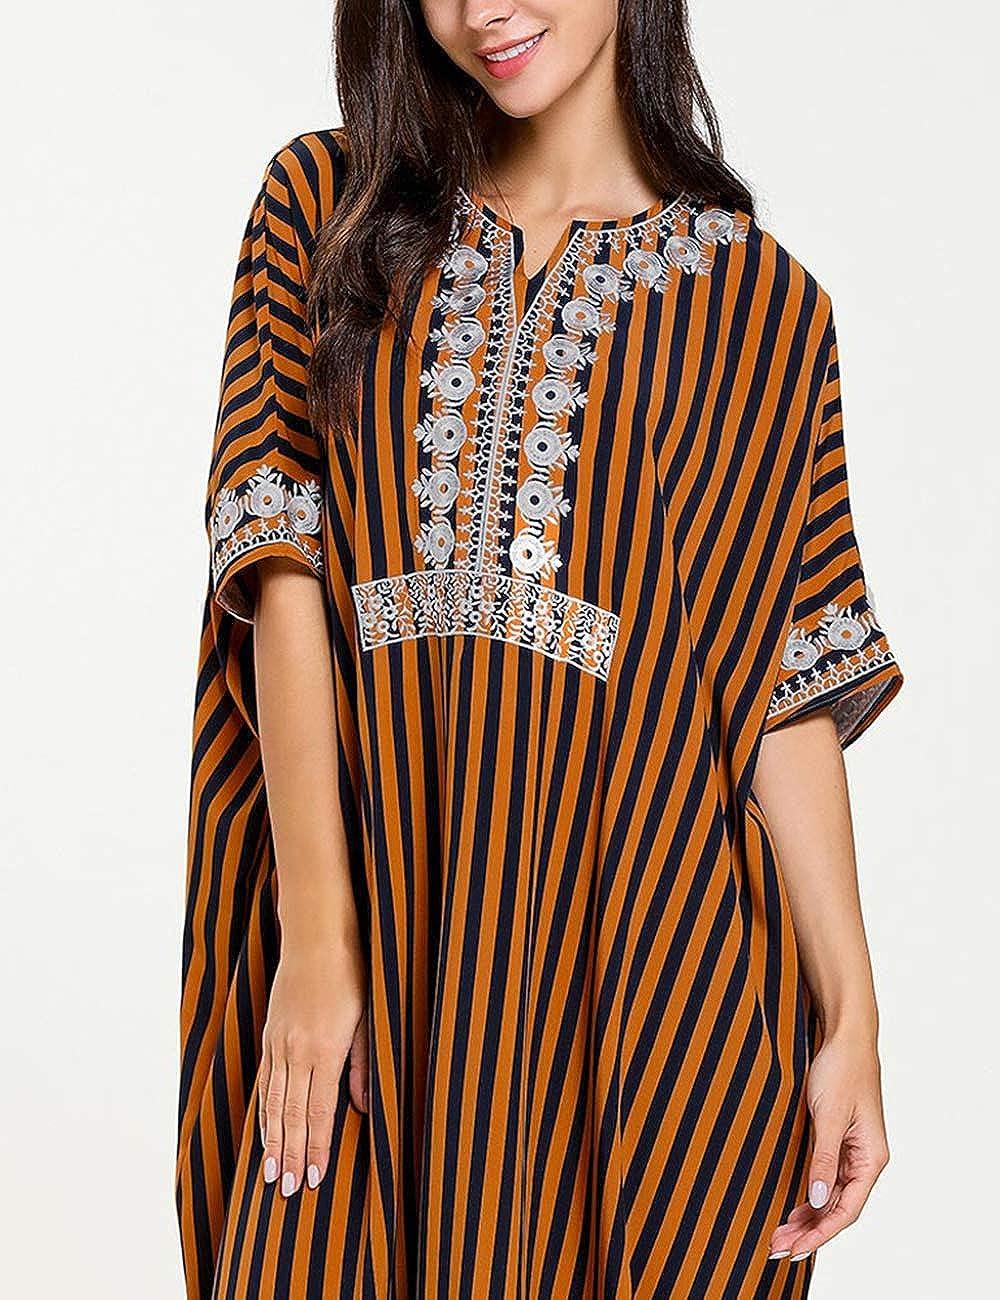 besbomig Women Kaftan Tunic Kimono Free Size Maxi Party Dress V Neck Long Cover Up Brown